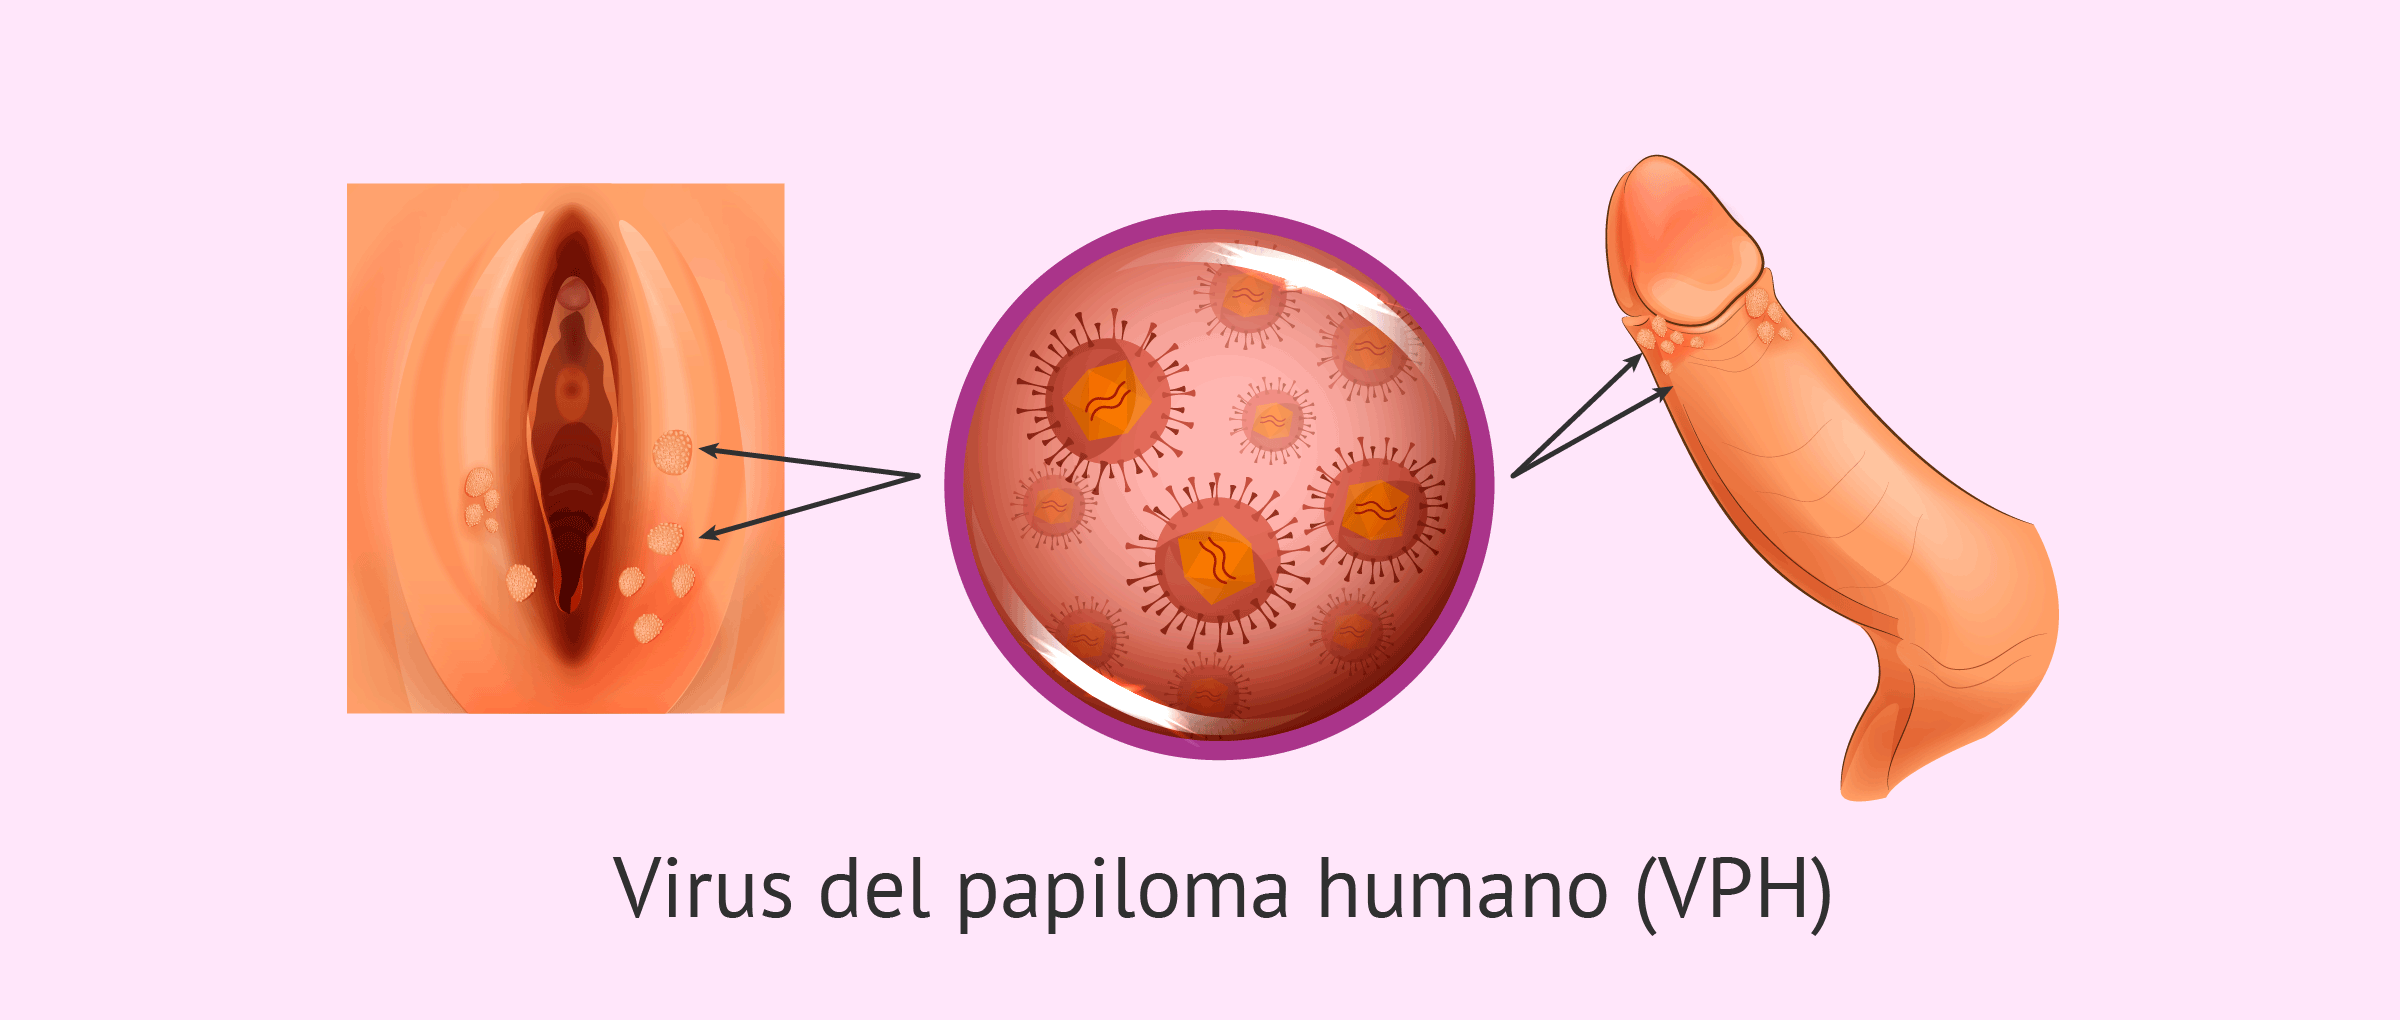 viermi tubifex hpv vescica sintomi